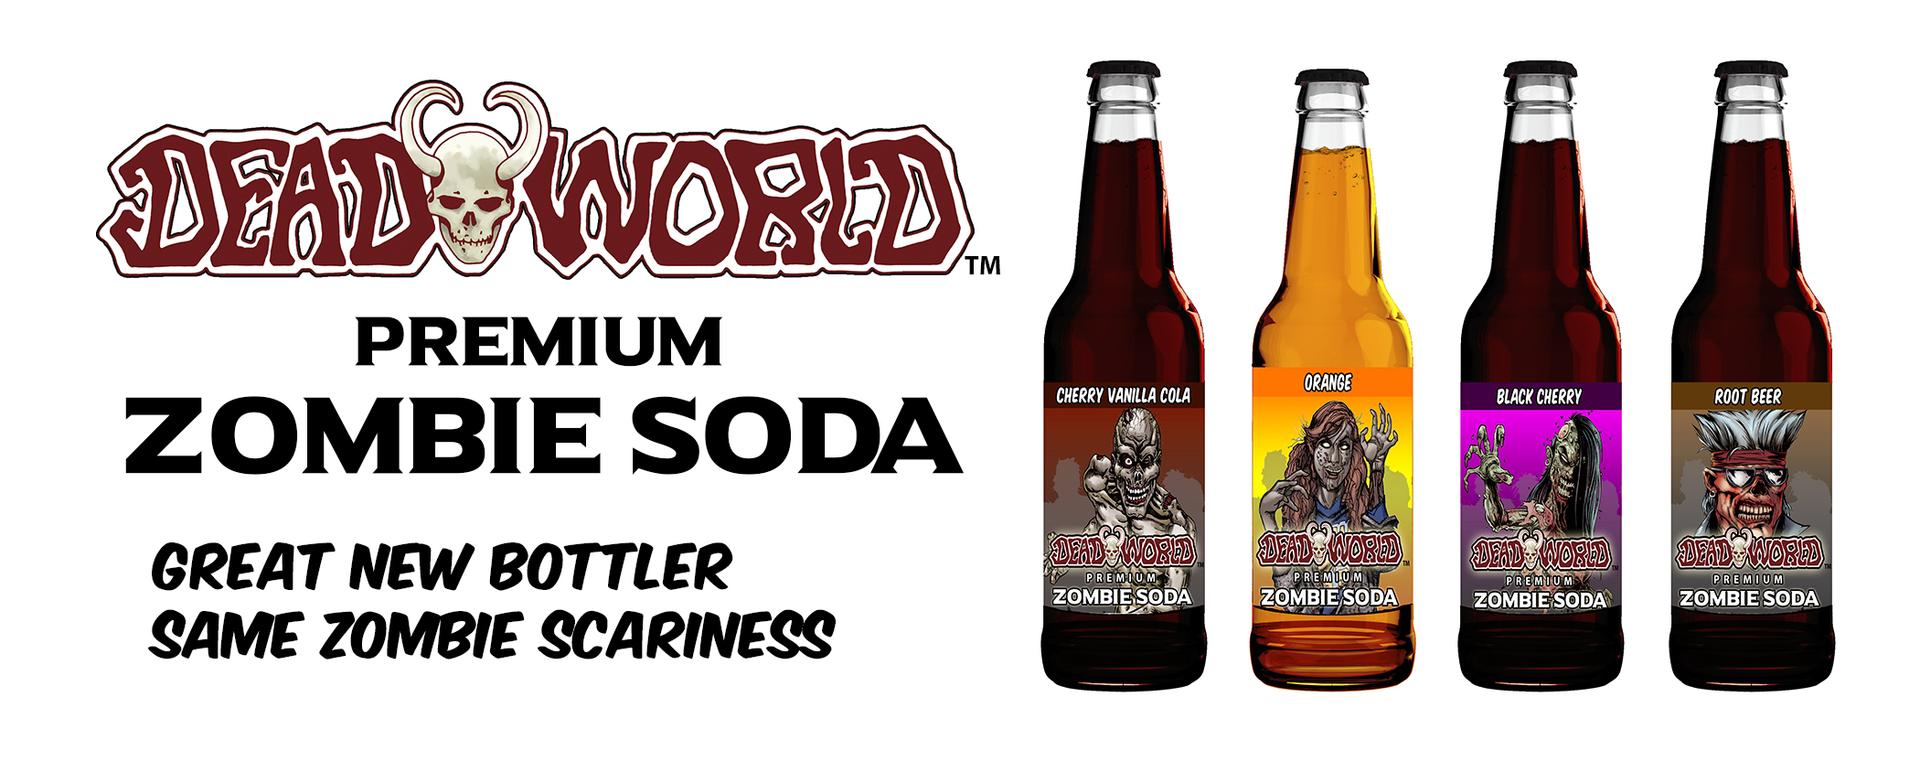 Deadworld Zombie Soda